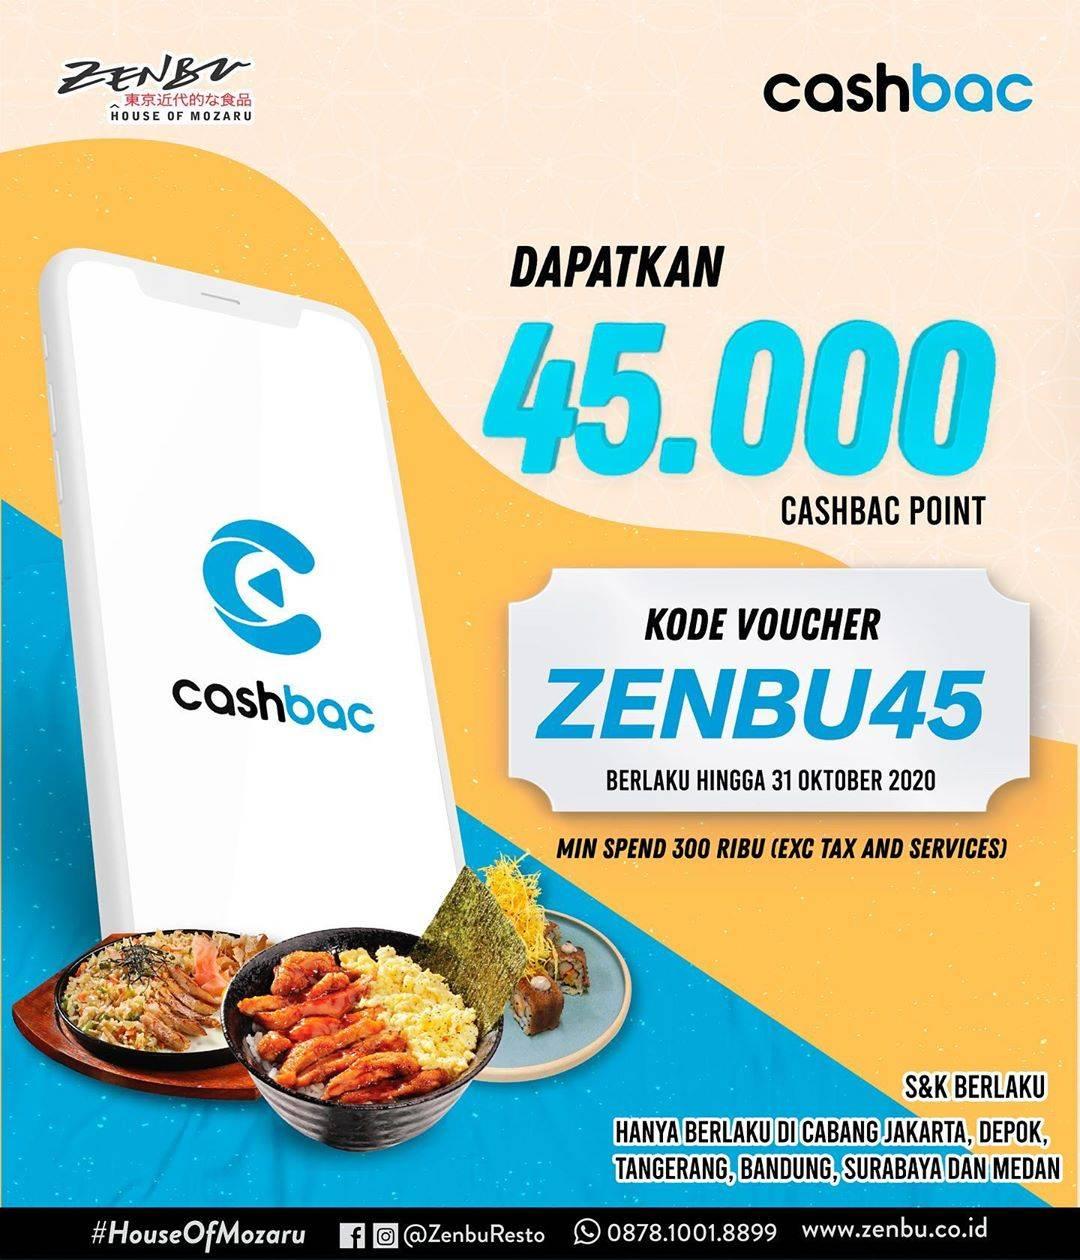 Diskon Zenbu Cashback Rp. 45.000 Dengan Cashbac